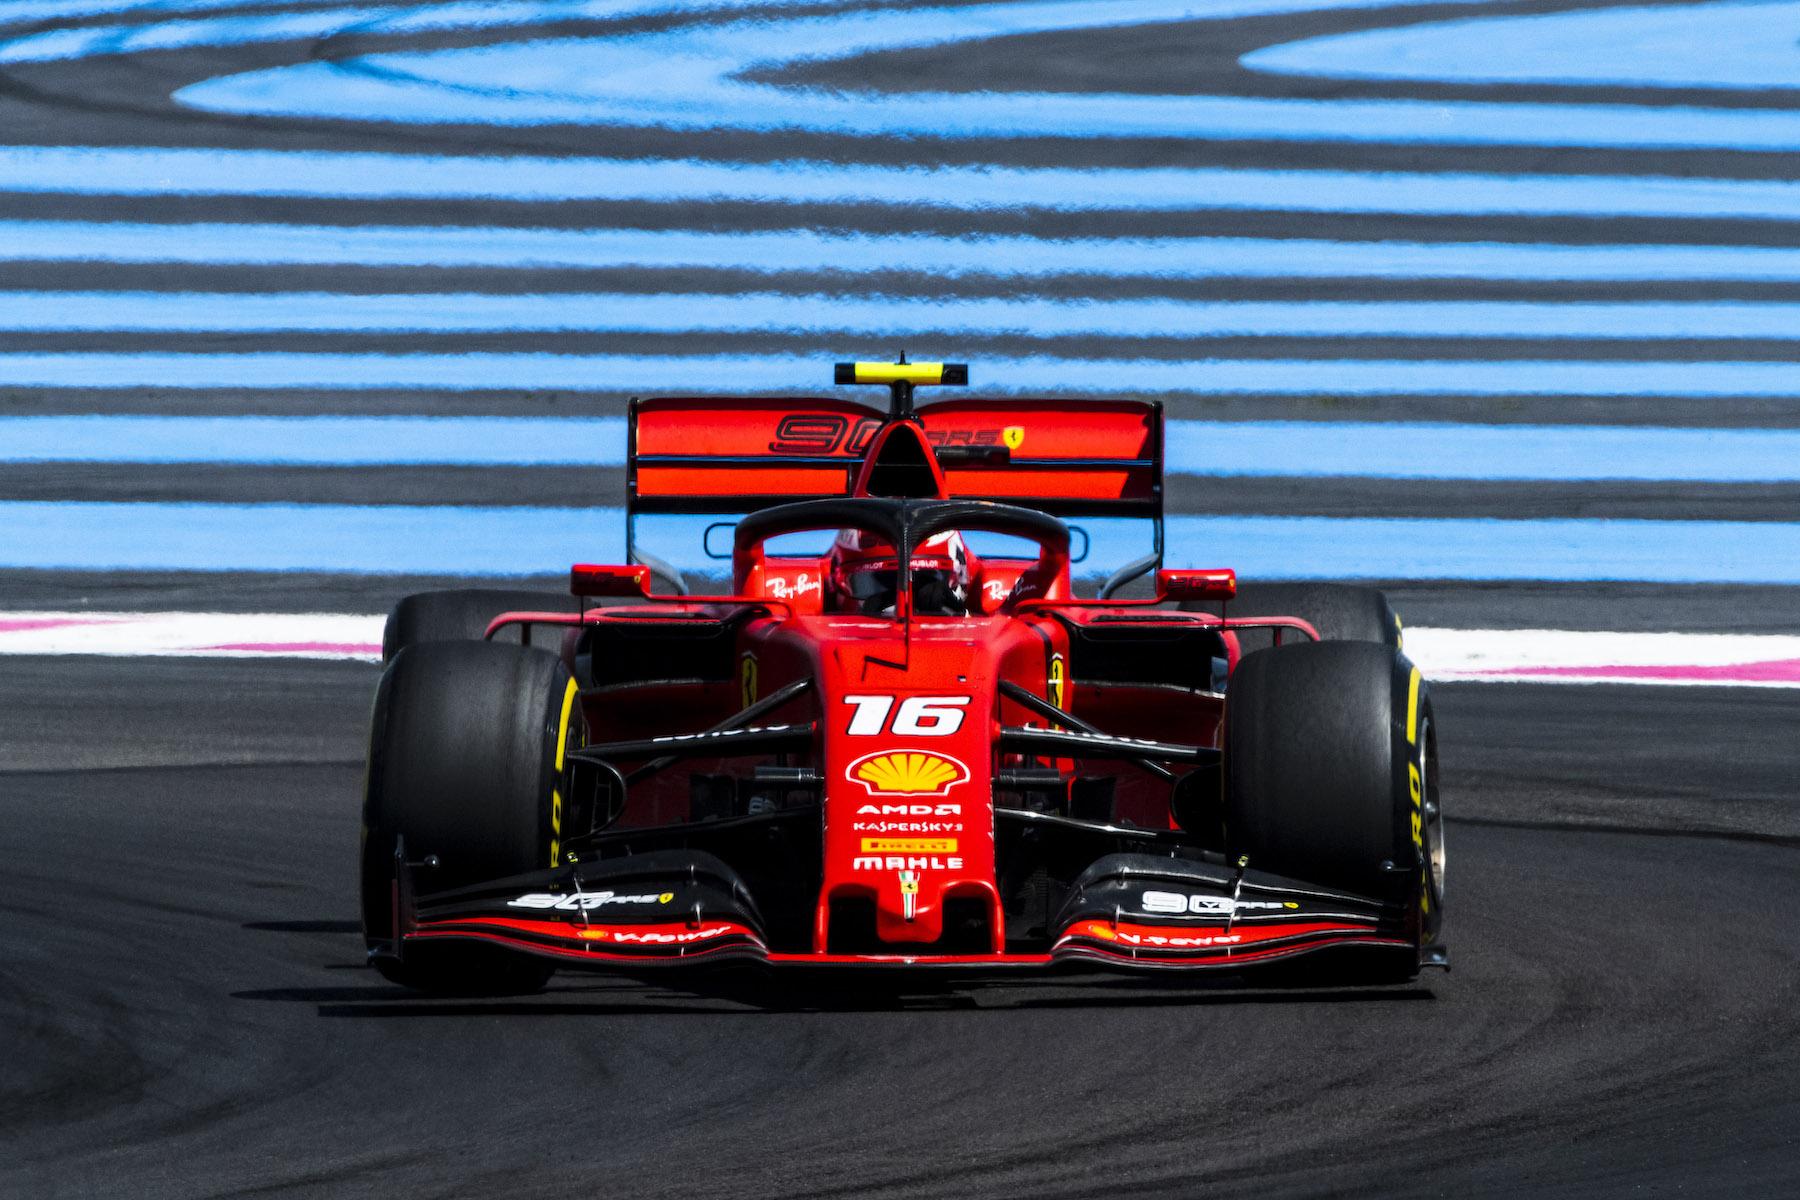 3 2019 French GP Sunday 41.jpg